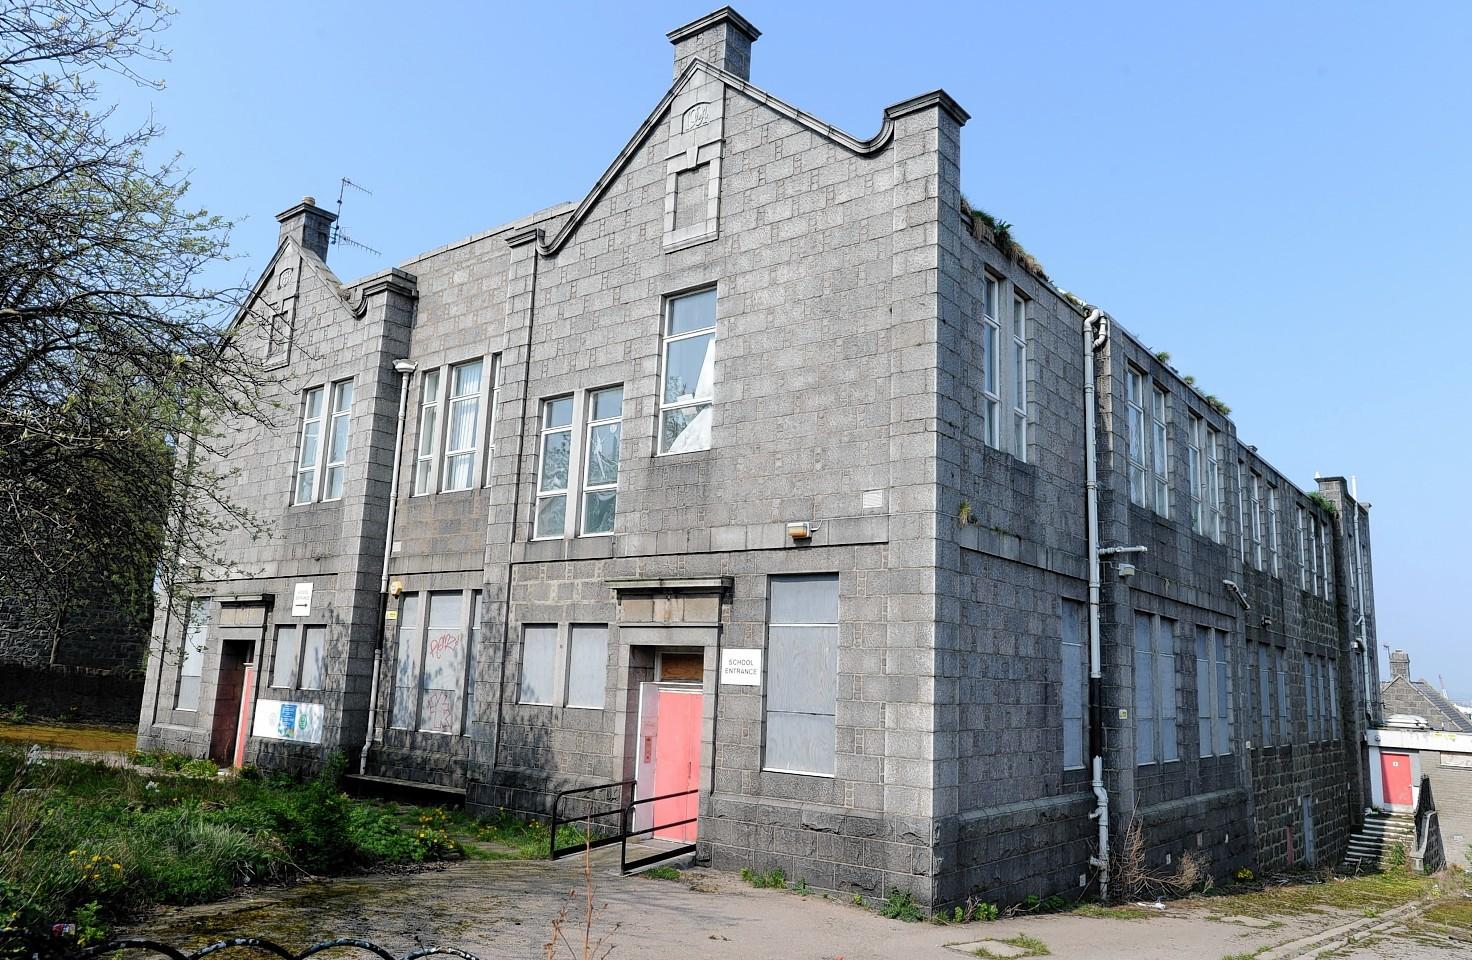 Torry's Victoria Road School